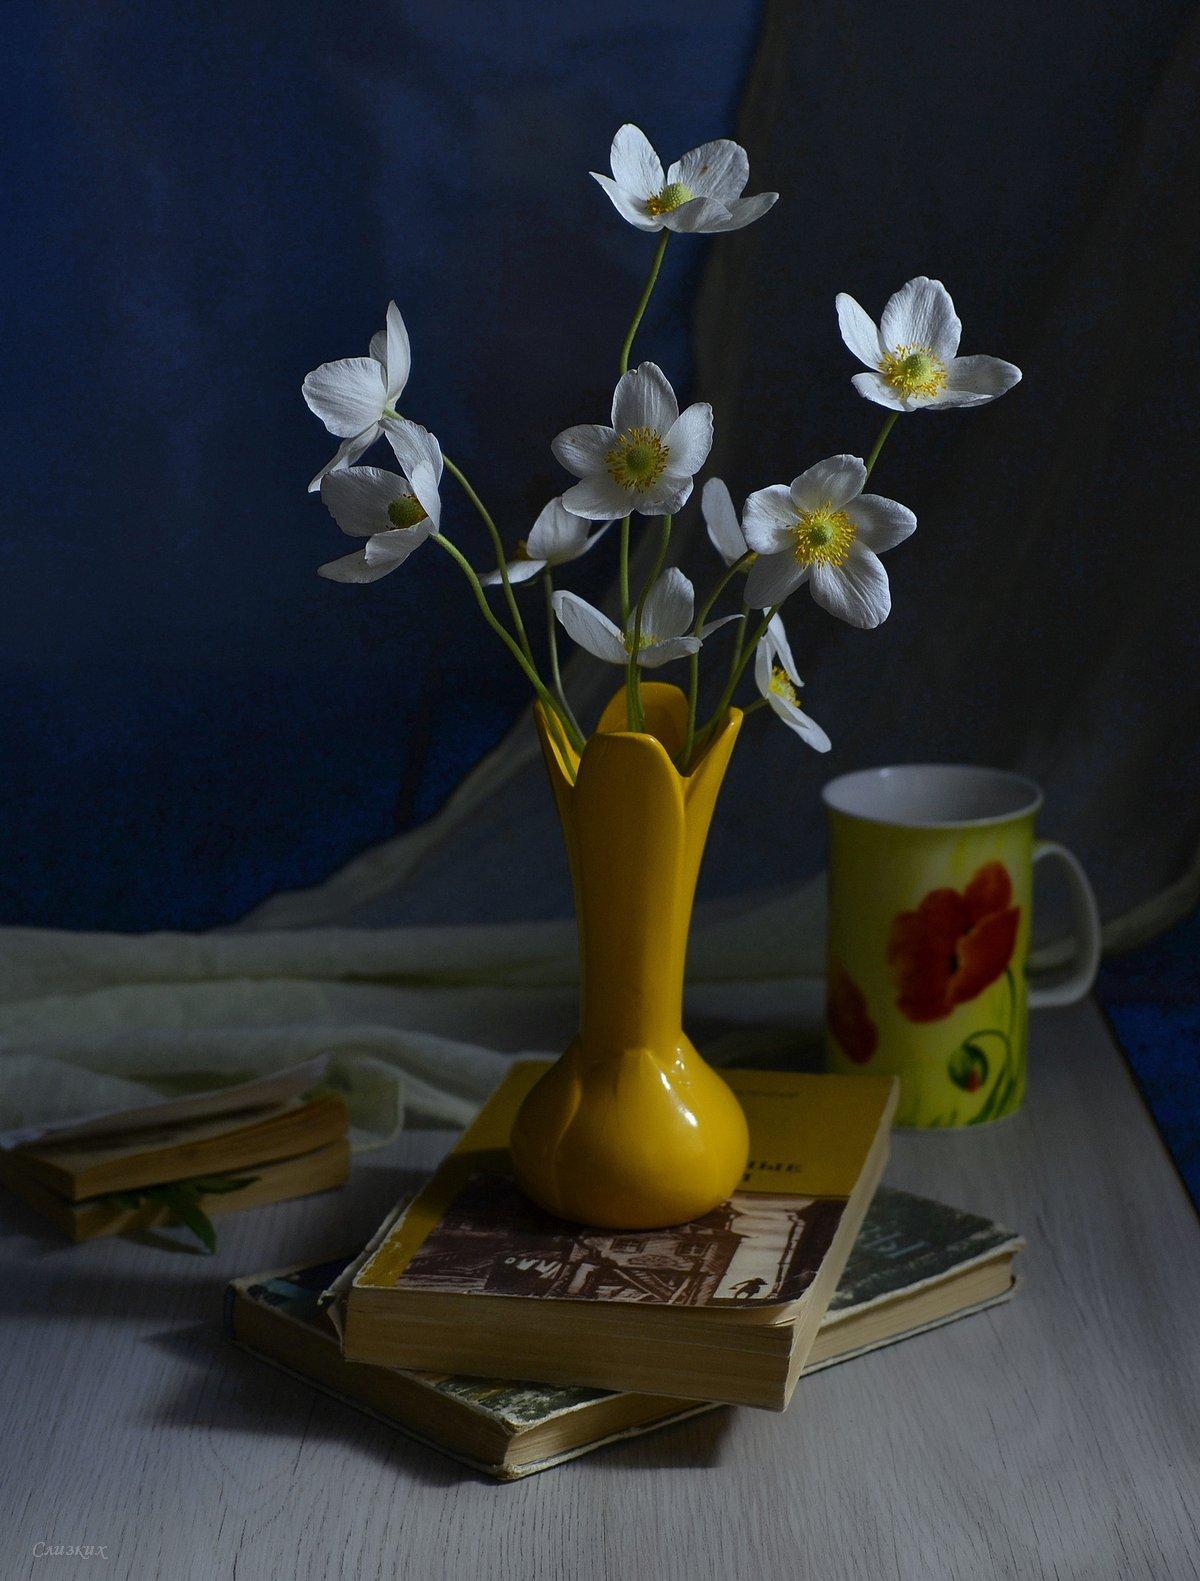 натюрморт,композиция,свет,весна,букет, Инаида